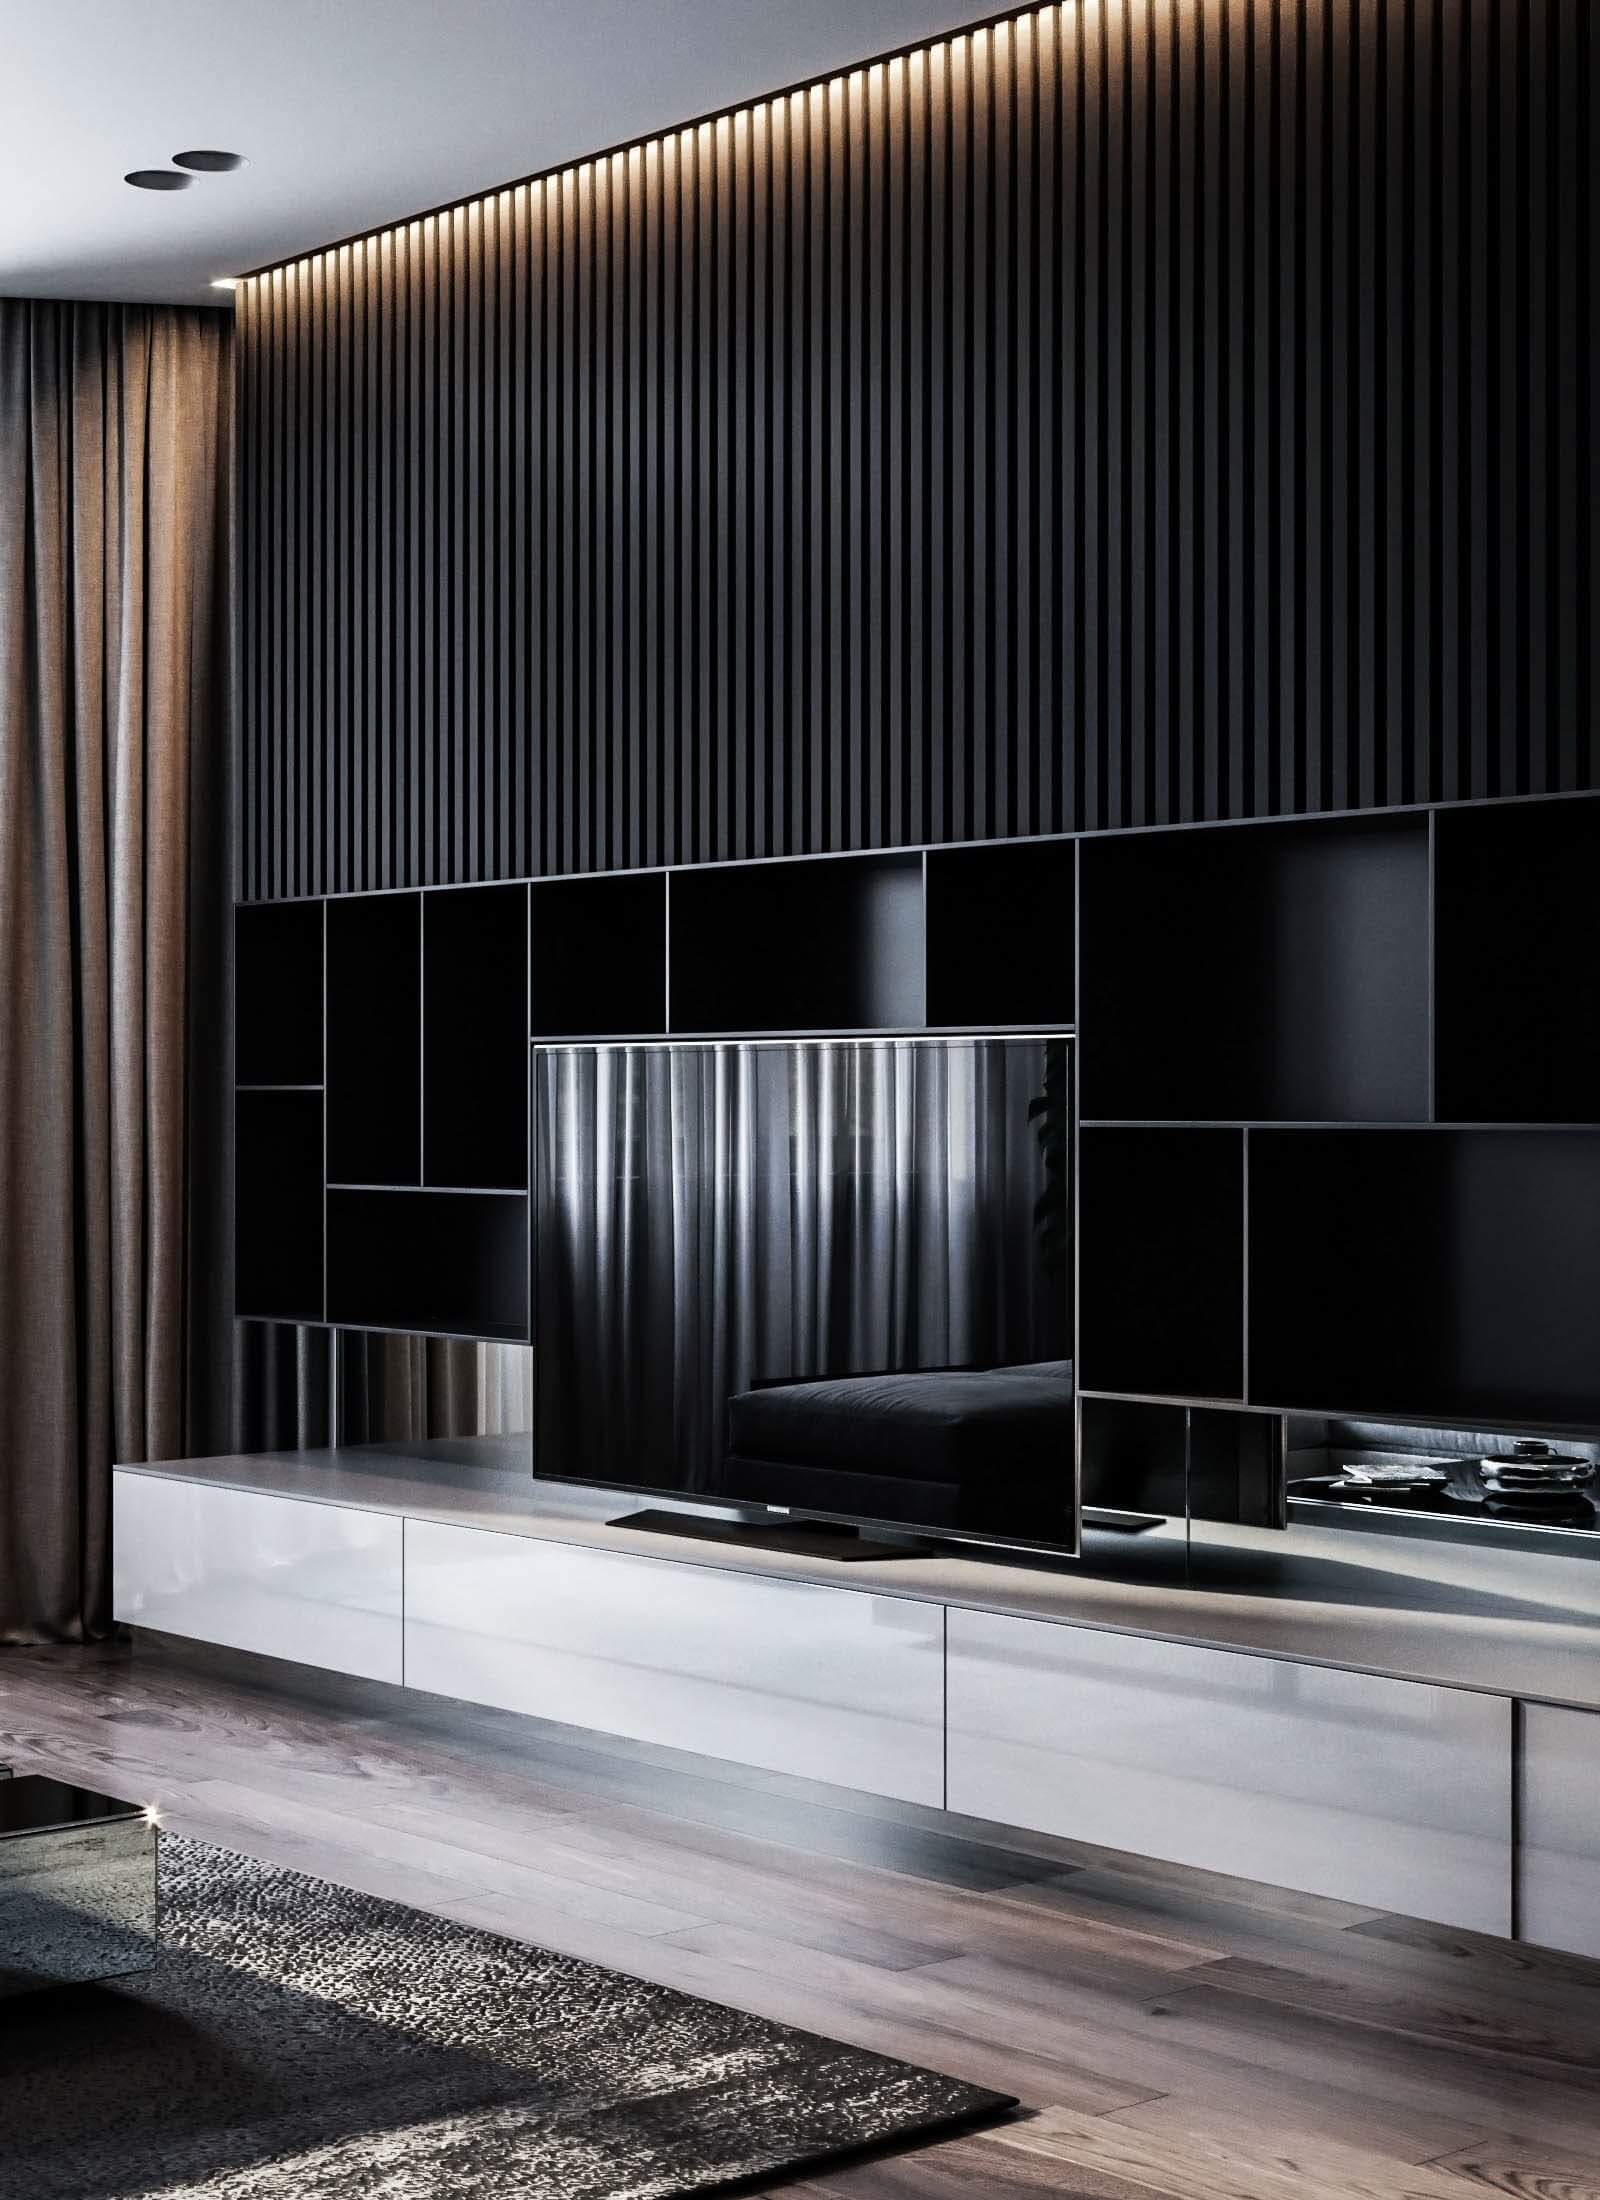 Dubrovka apartment tv wall living room - cgi visualization